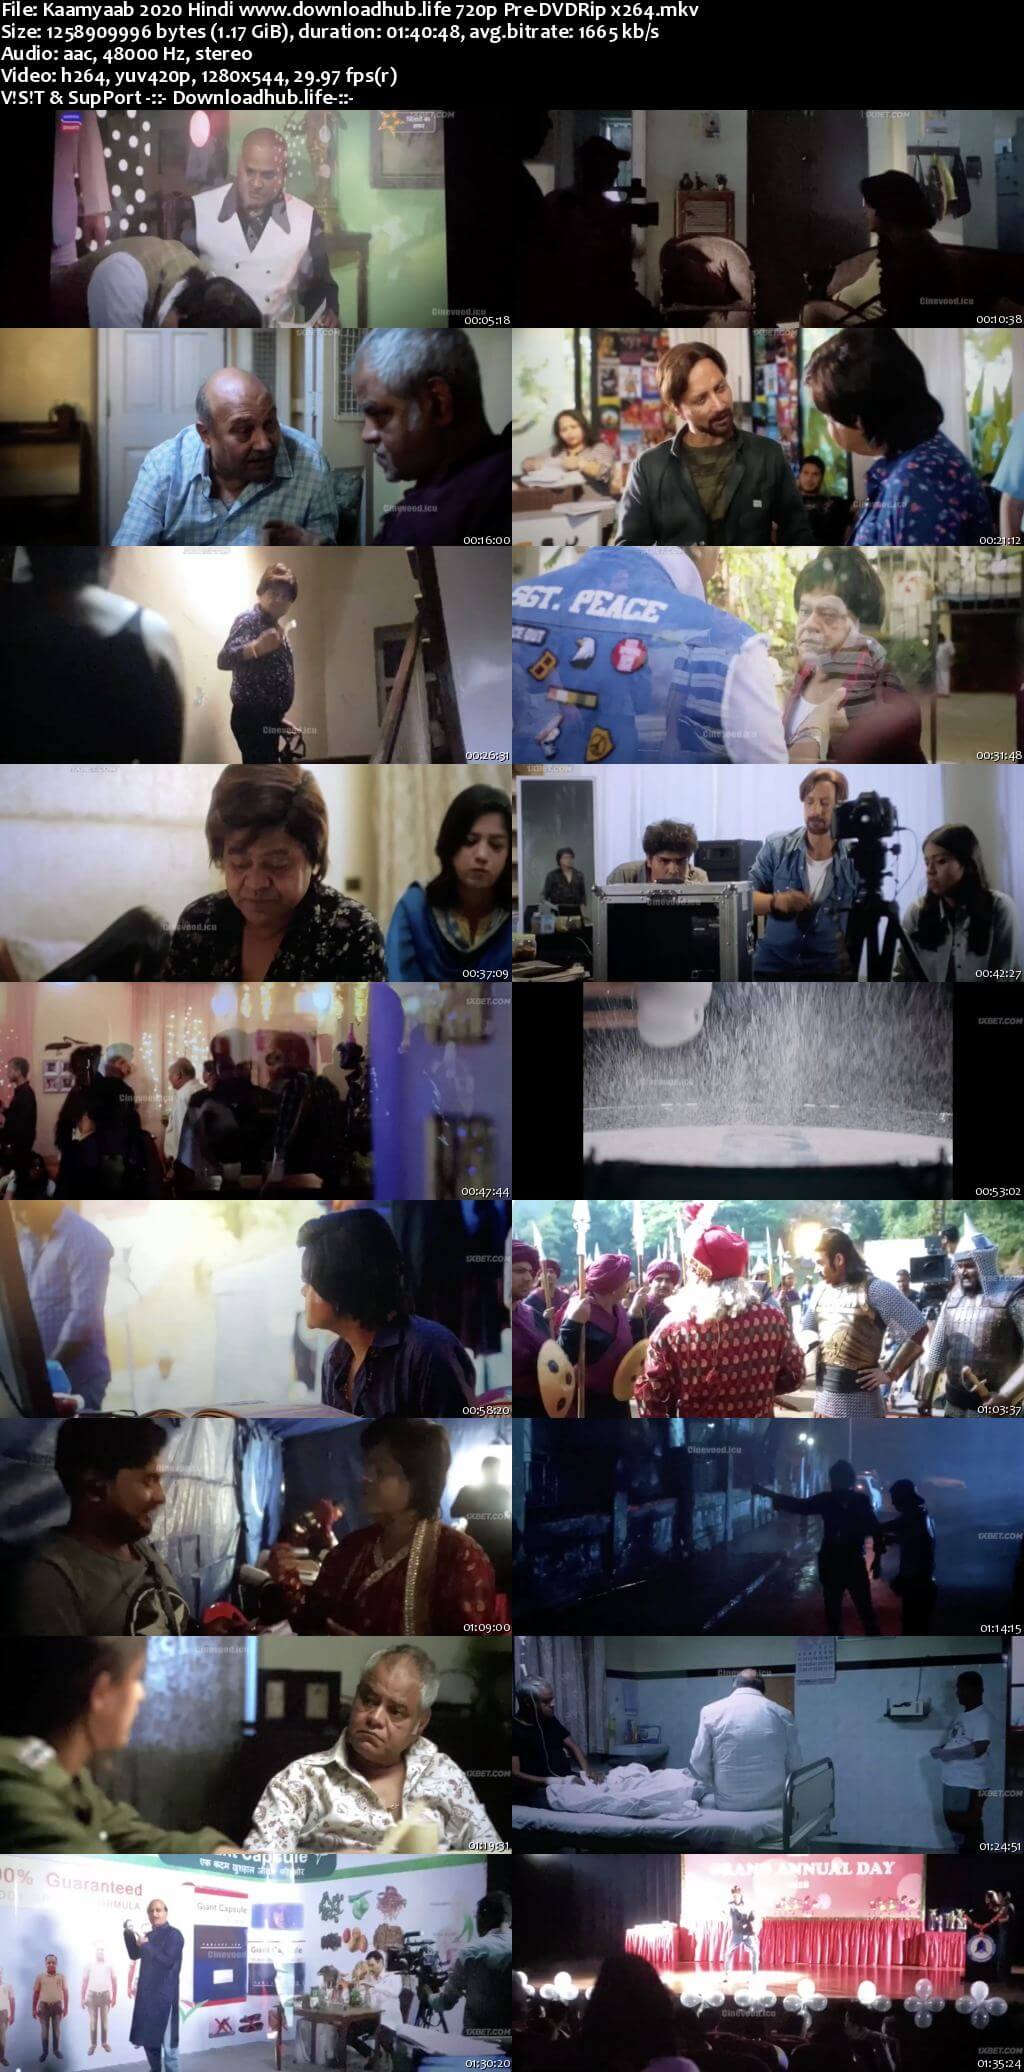 Kaamyaab 2020 Hindi 720p 480p Pre-DVDRip x264